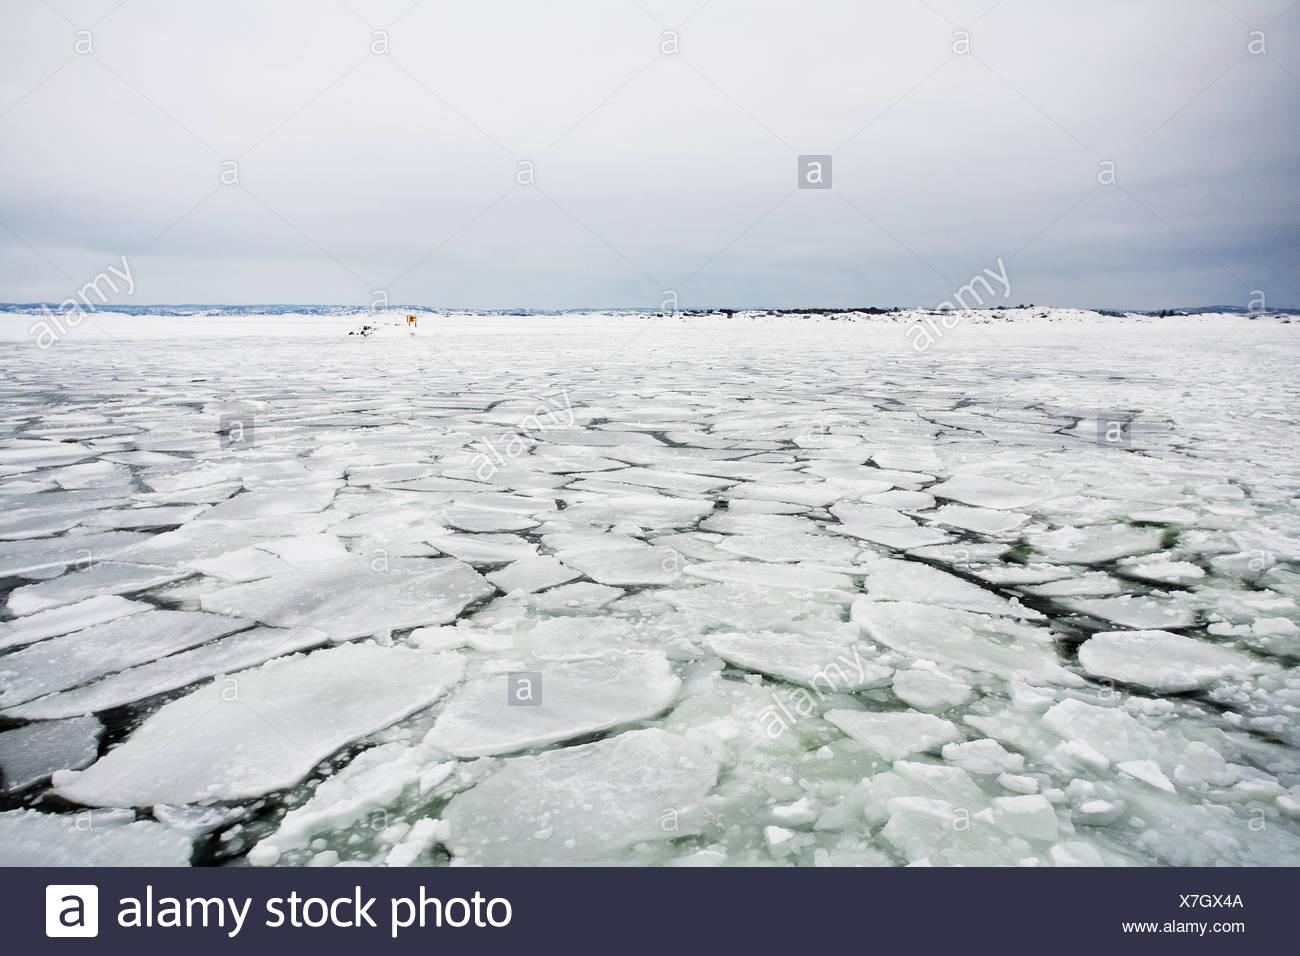 Capa de hielo agrietado Imagen De Stock